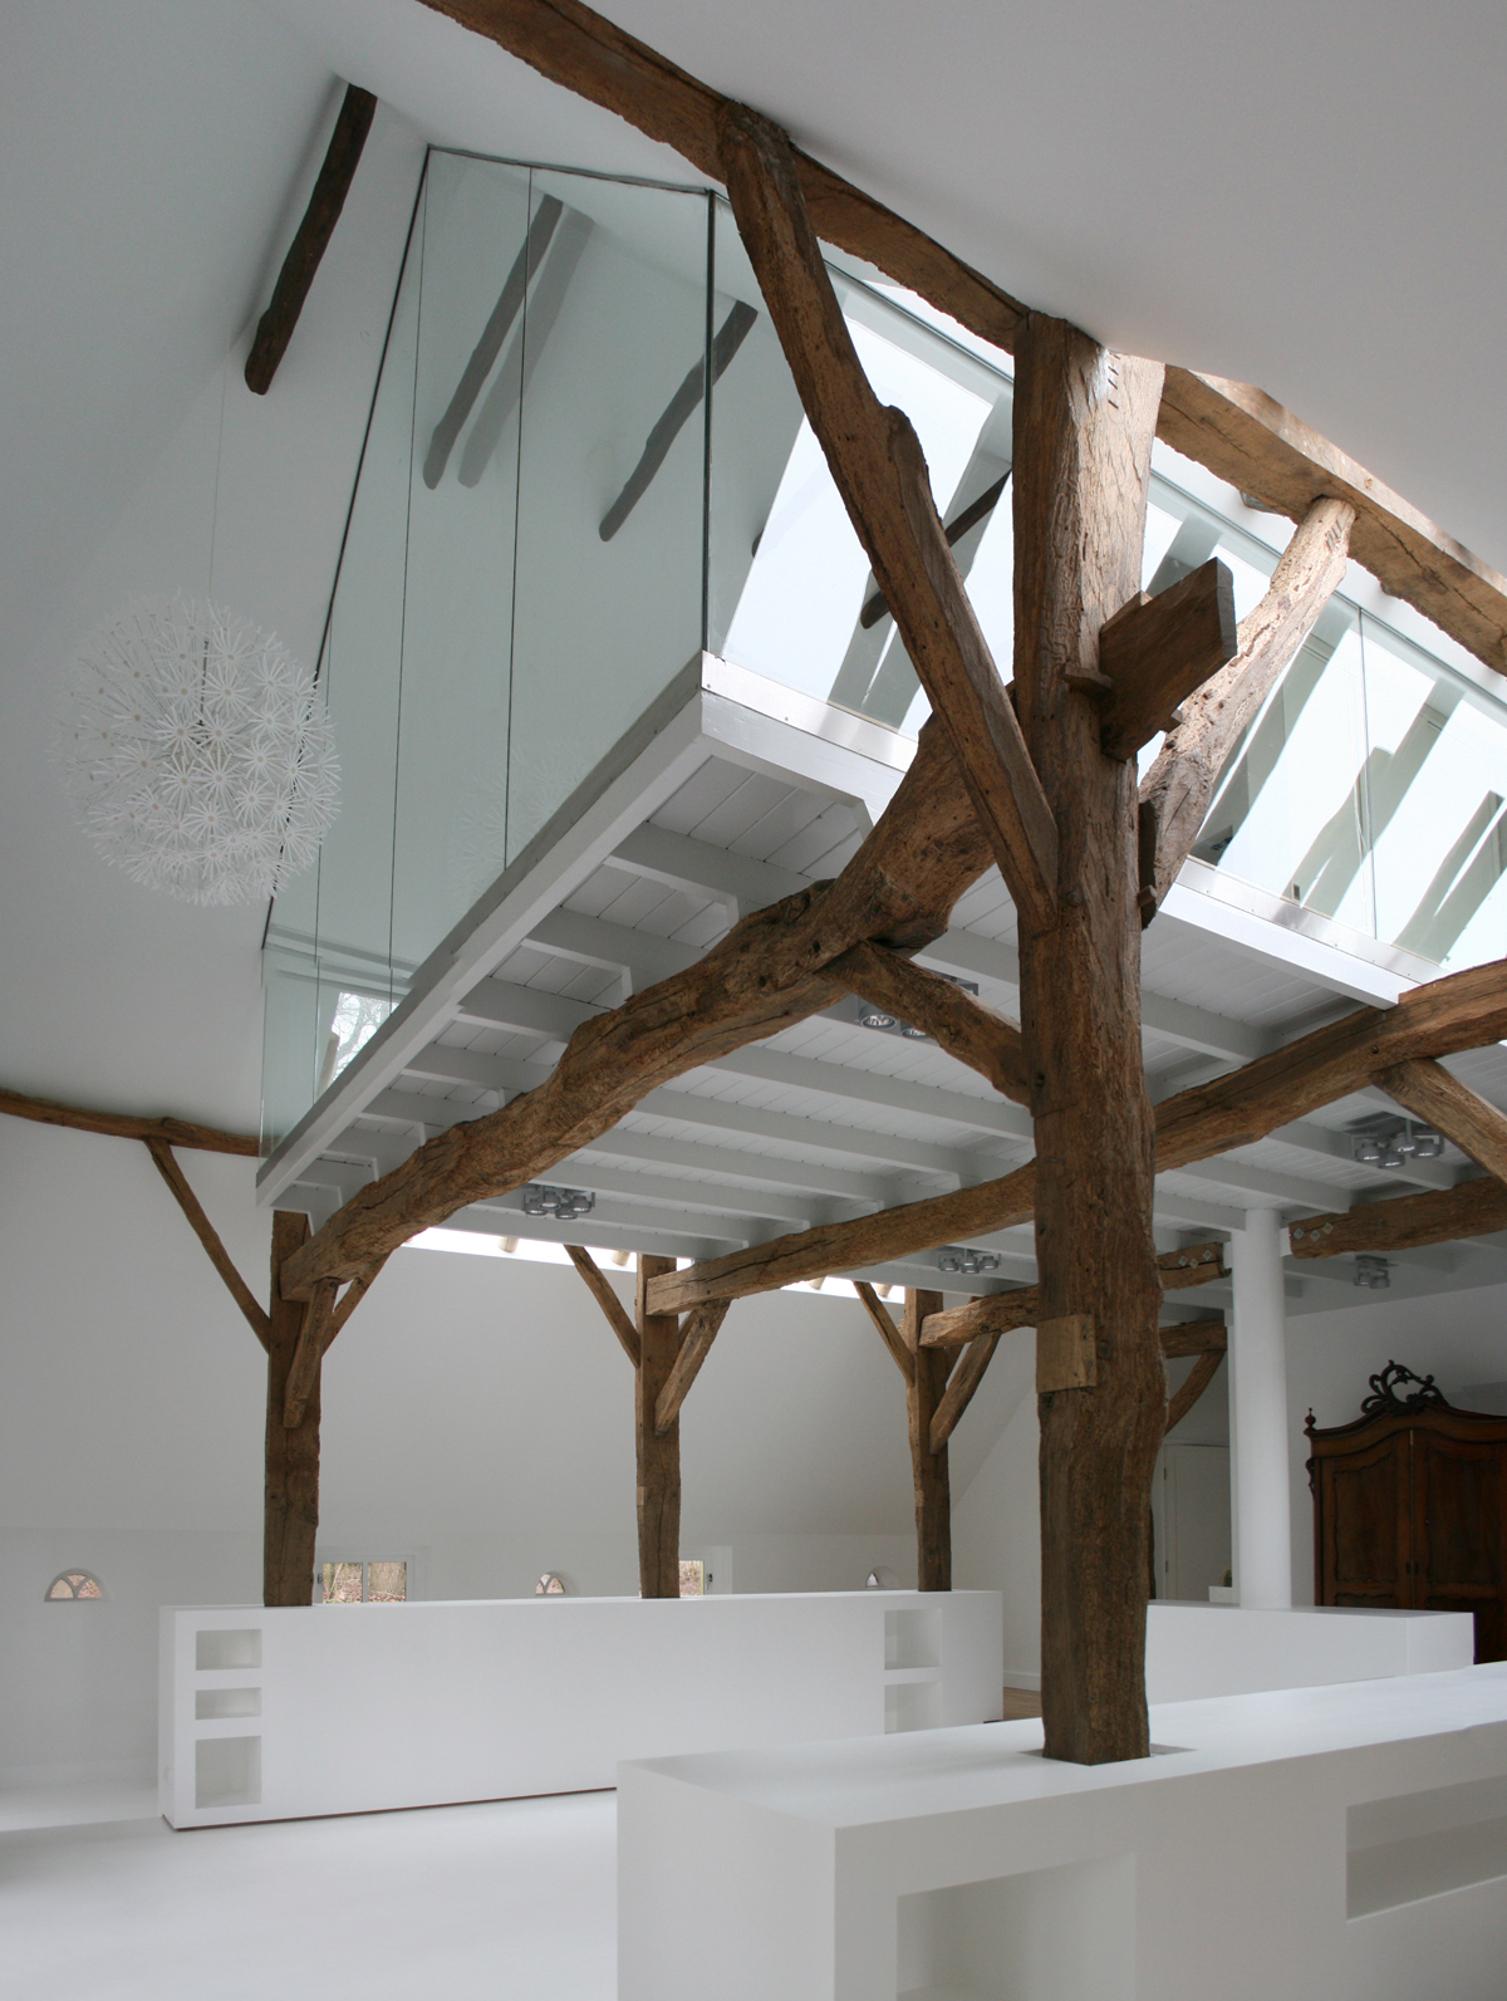 Stichting living daylights boerderij de borkeld - Interieur modern houten huis ...